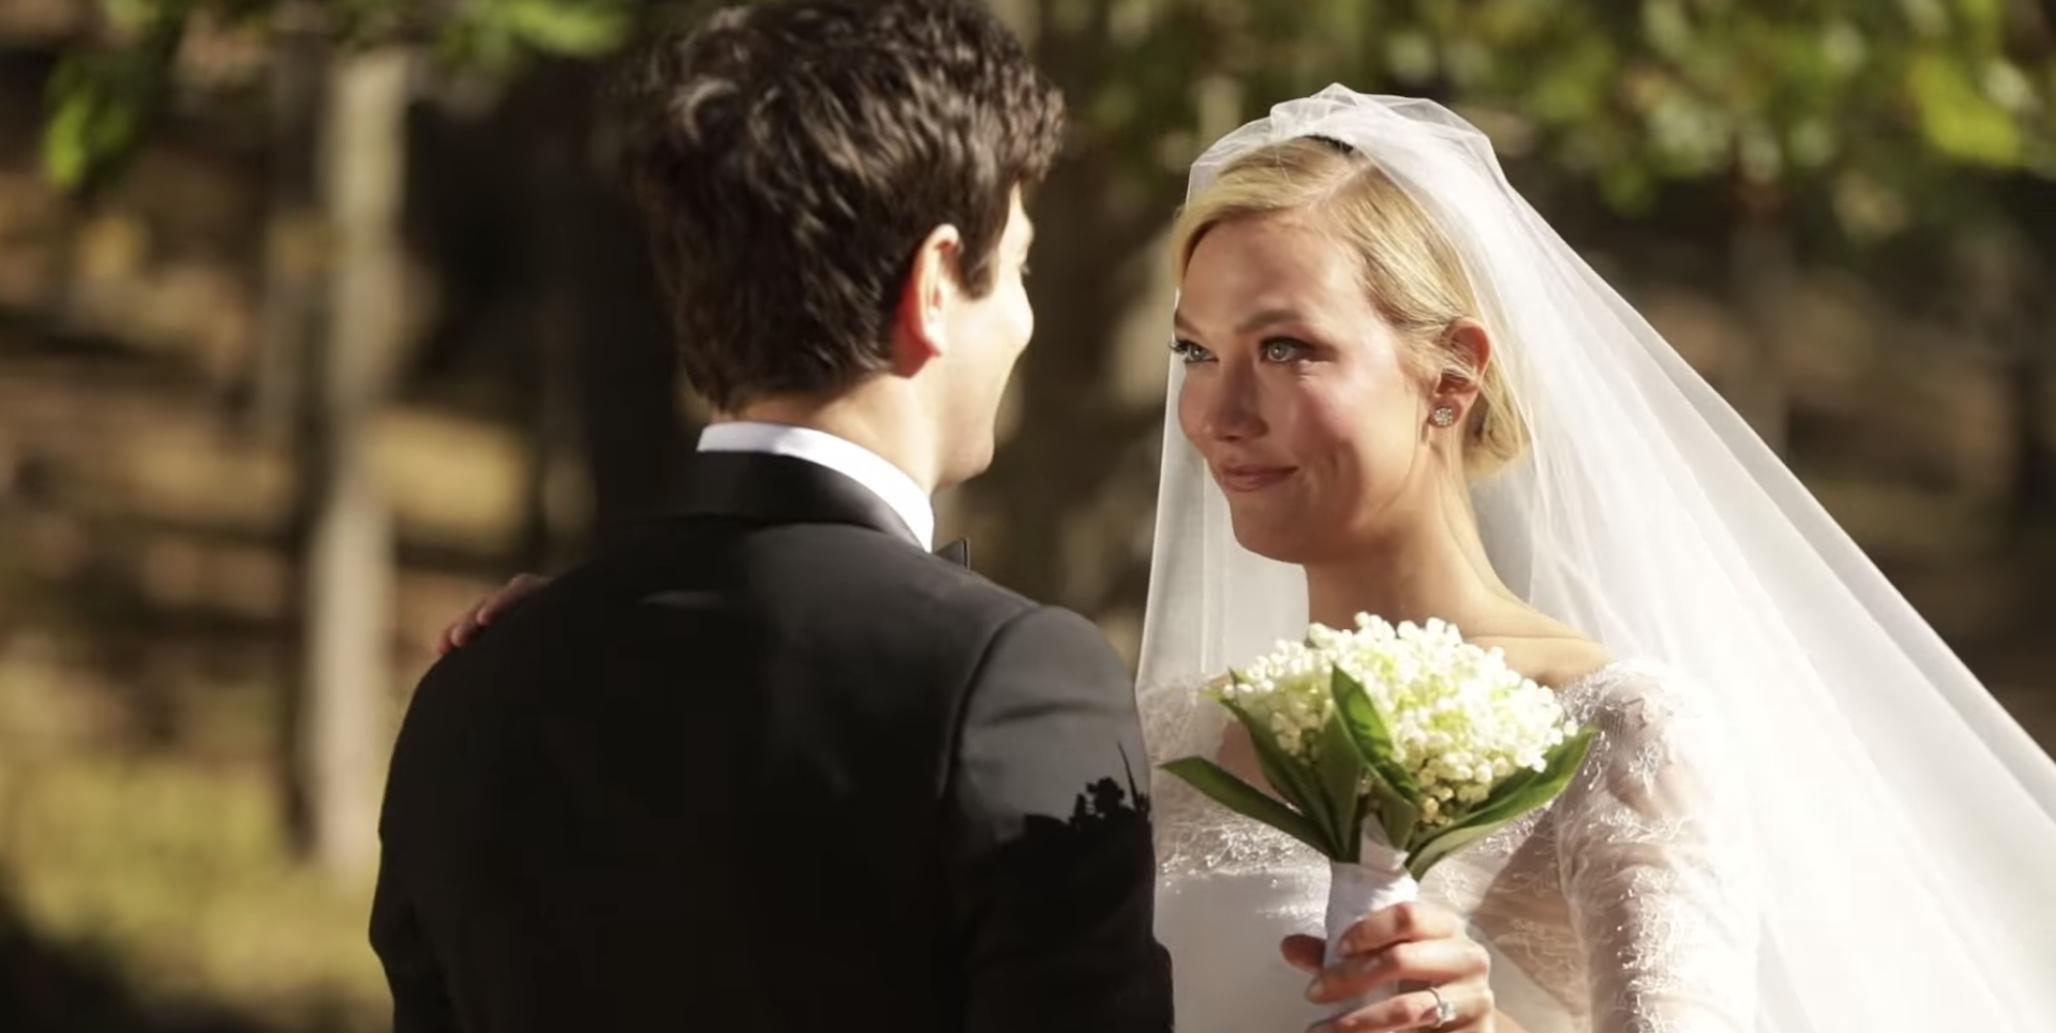 14c9d242a1036fa Karlie Kloss Shares Emotional New Wedding Footage with Joshua Kushner